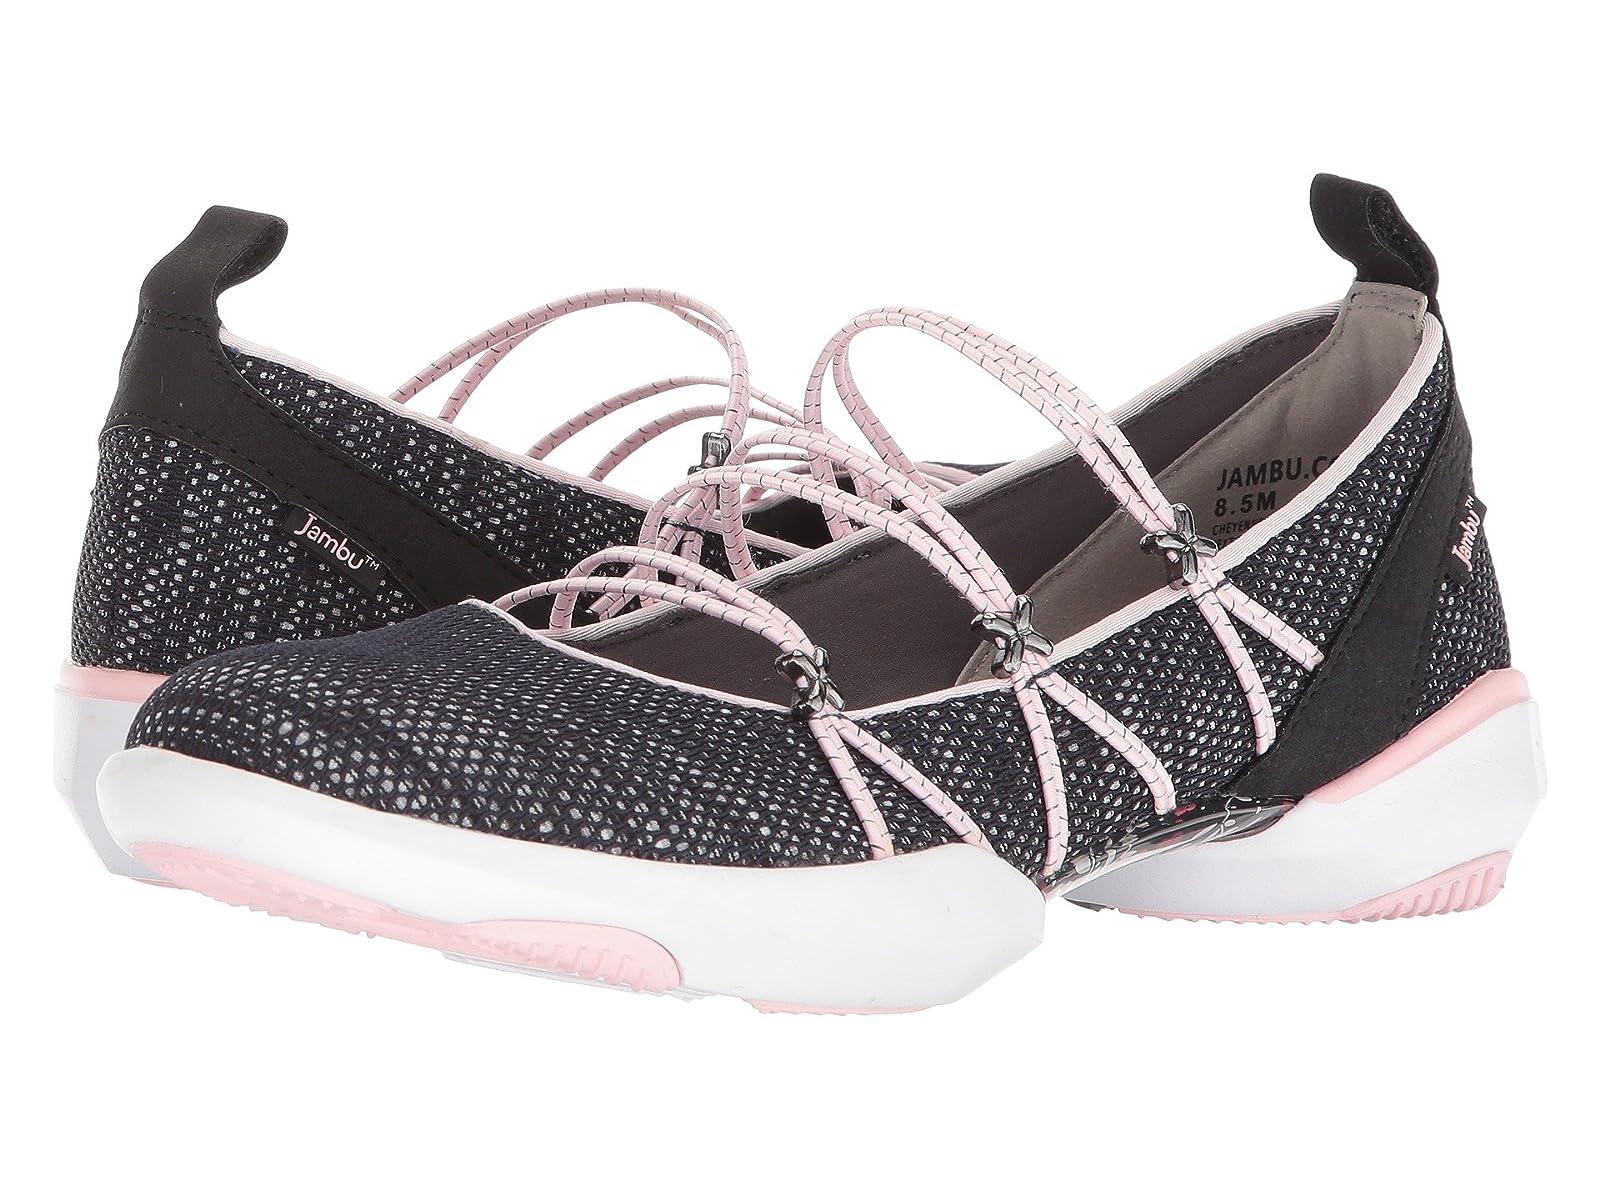 Jambu Cheyenne VeganAtmospheric grades have affordable shoes